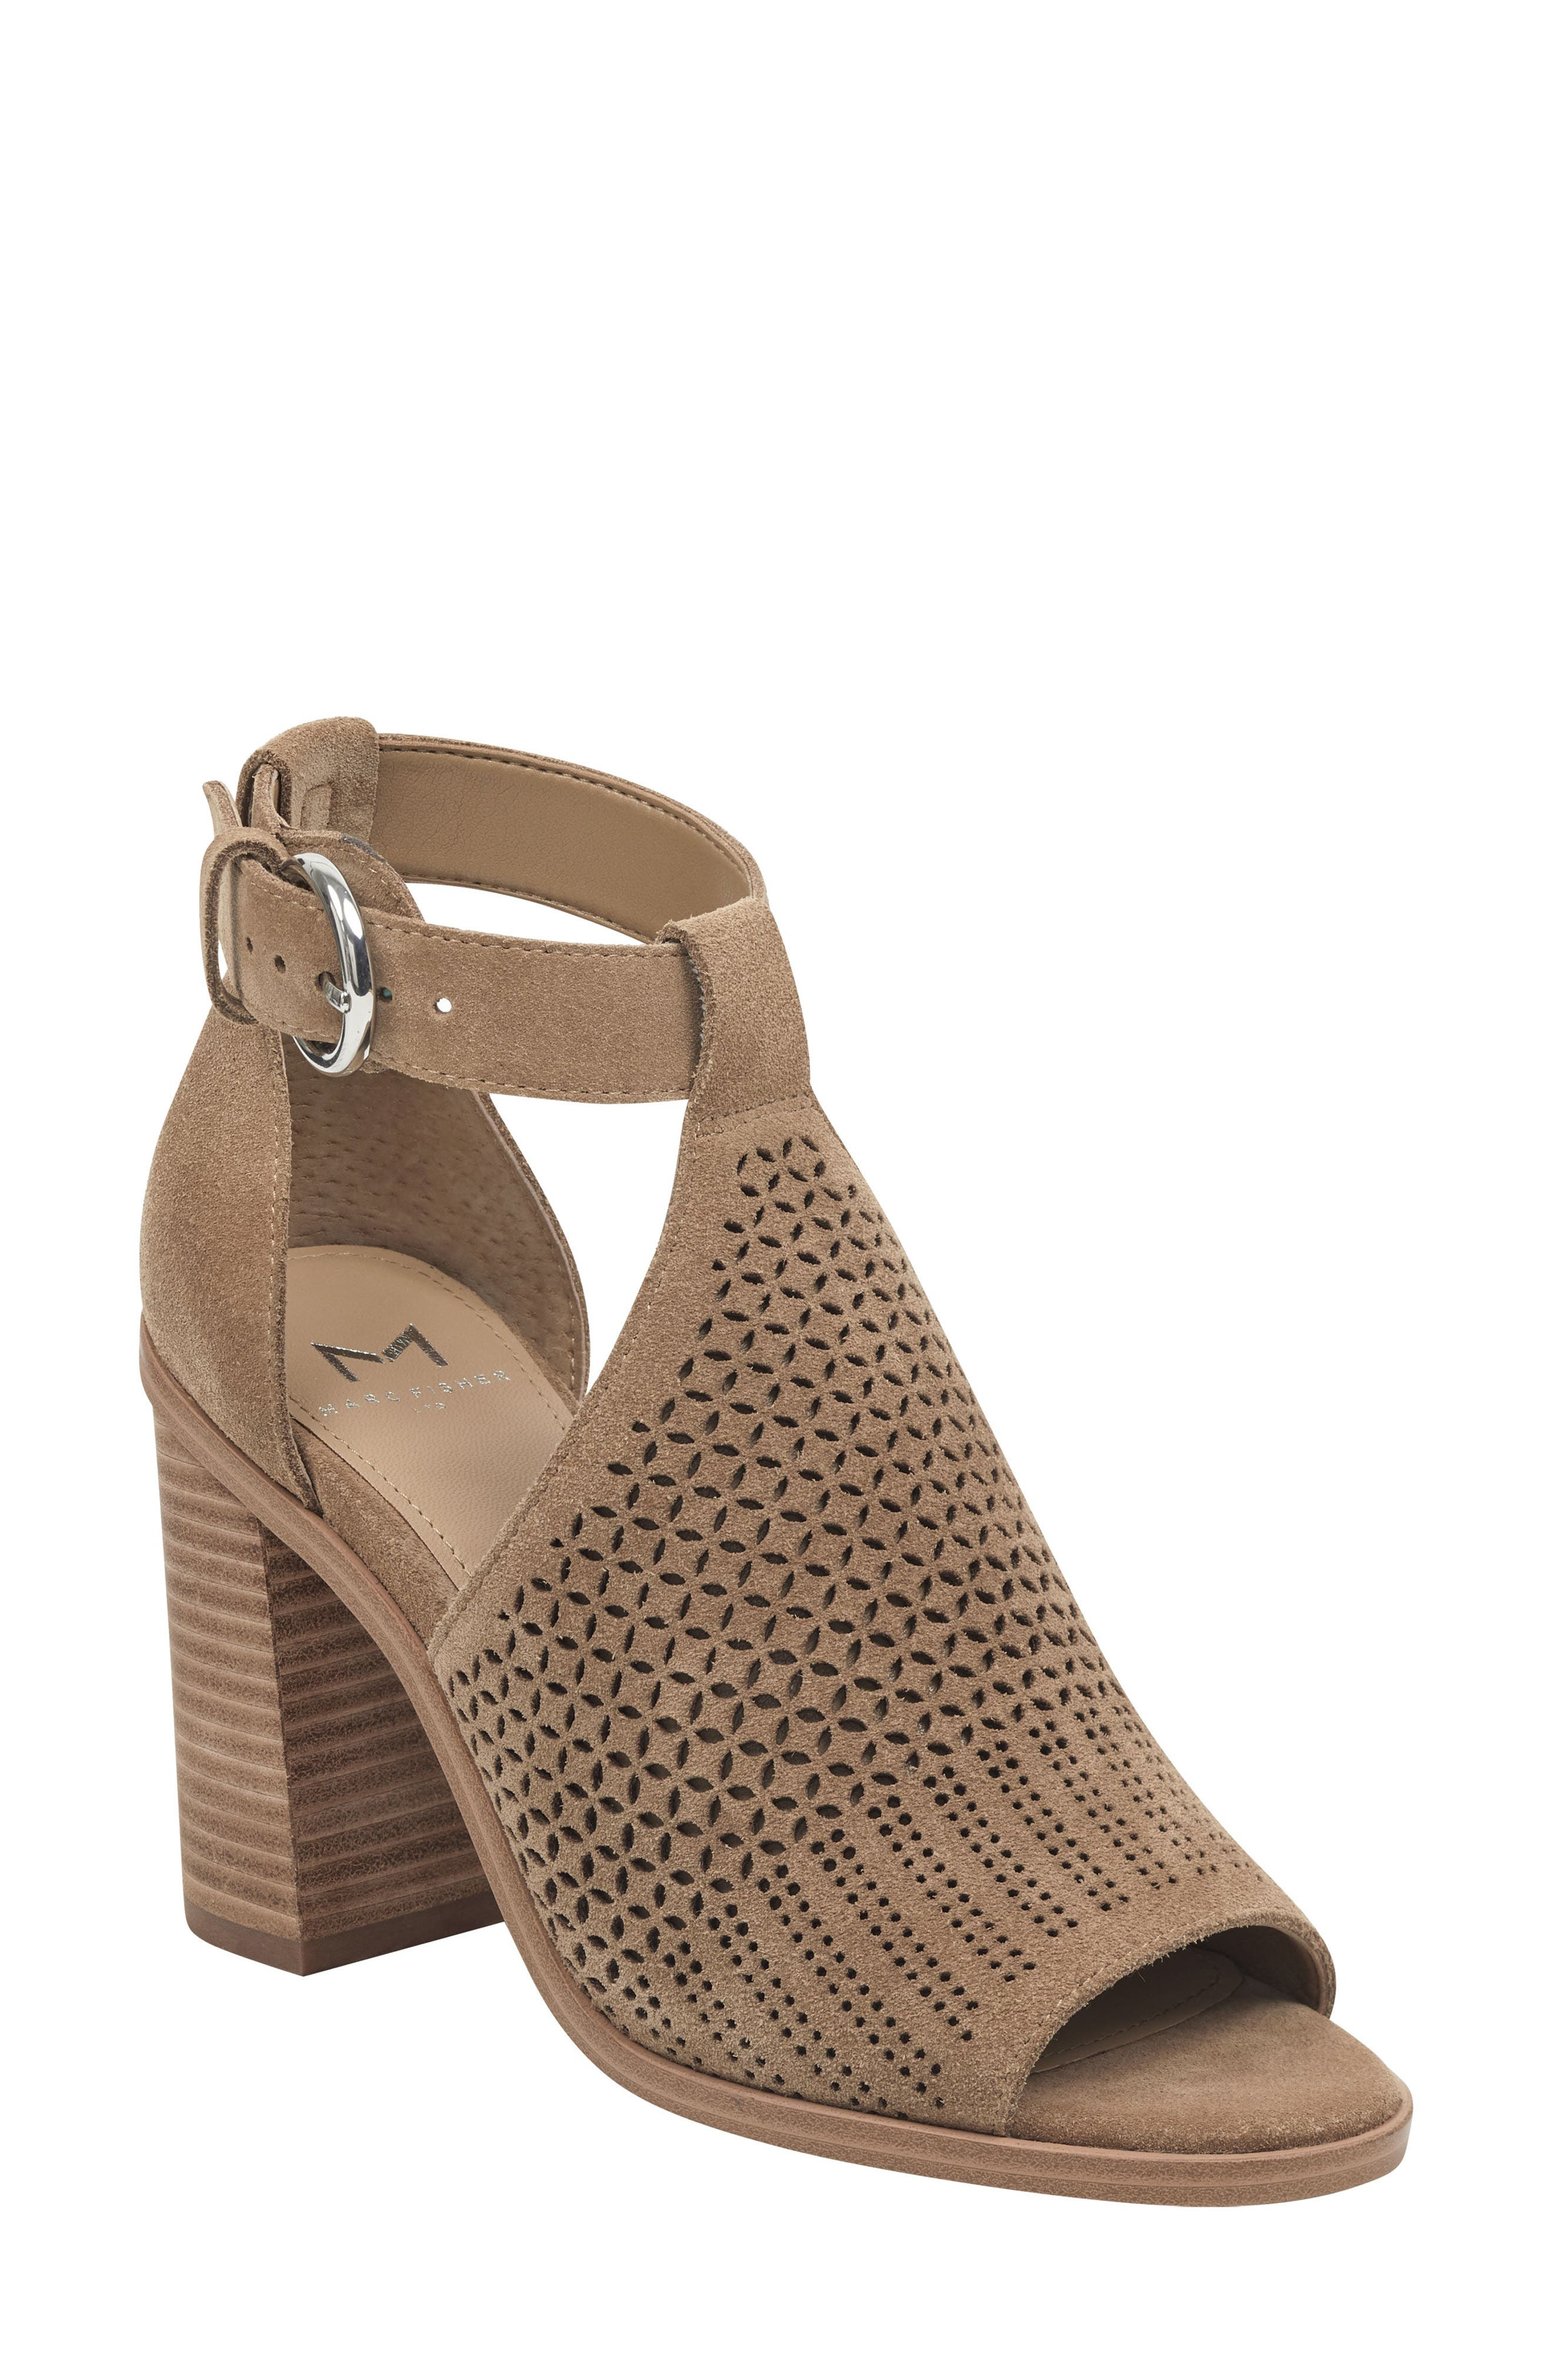 Marc Fisher Ltd Vixen Sandal, Brown